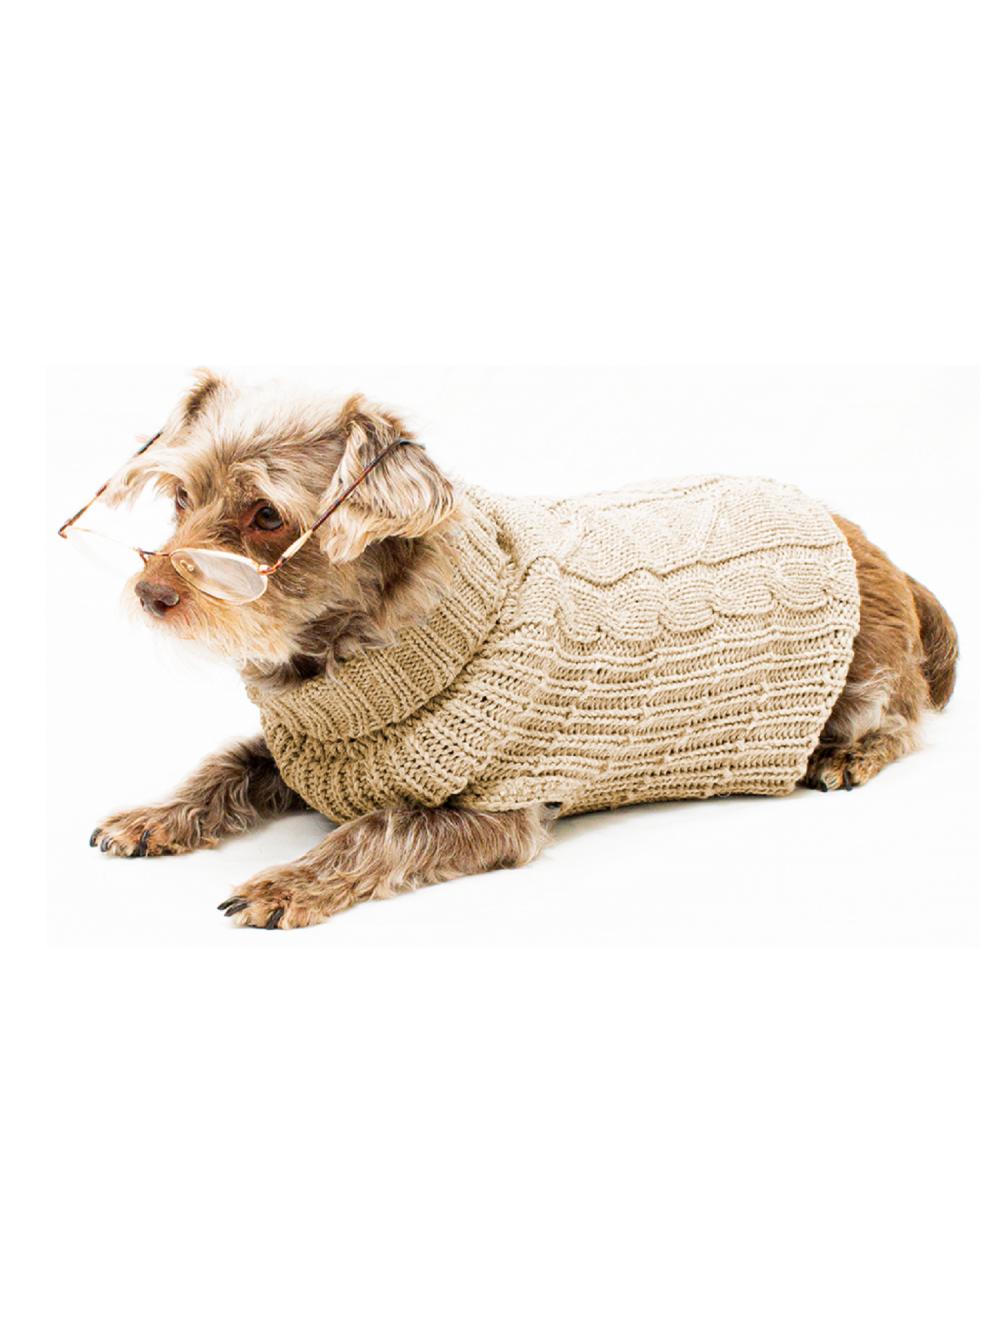 Saco Cody para Perros Beige talla XS - Ciudaddemascotas.com